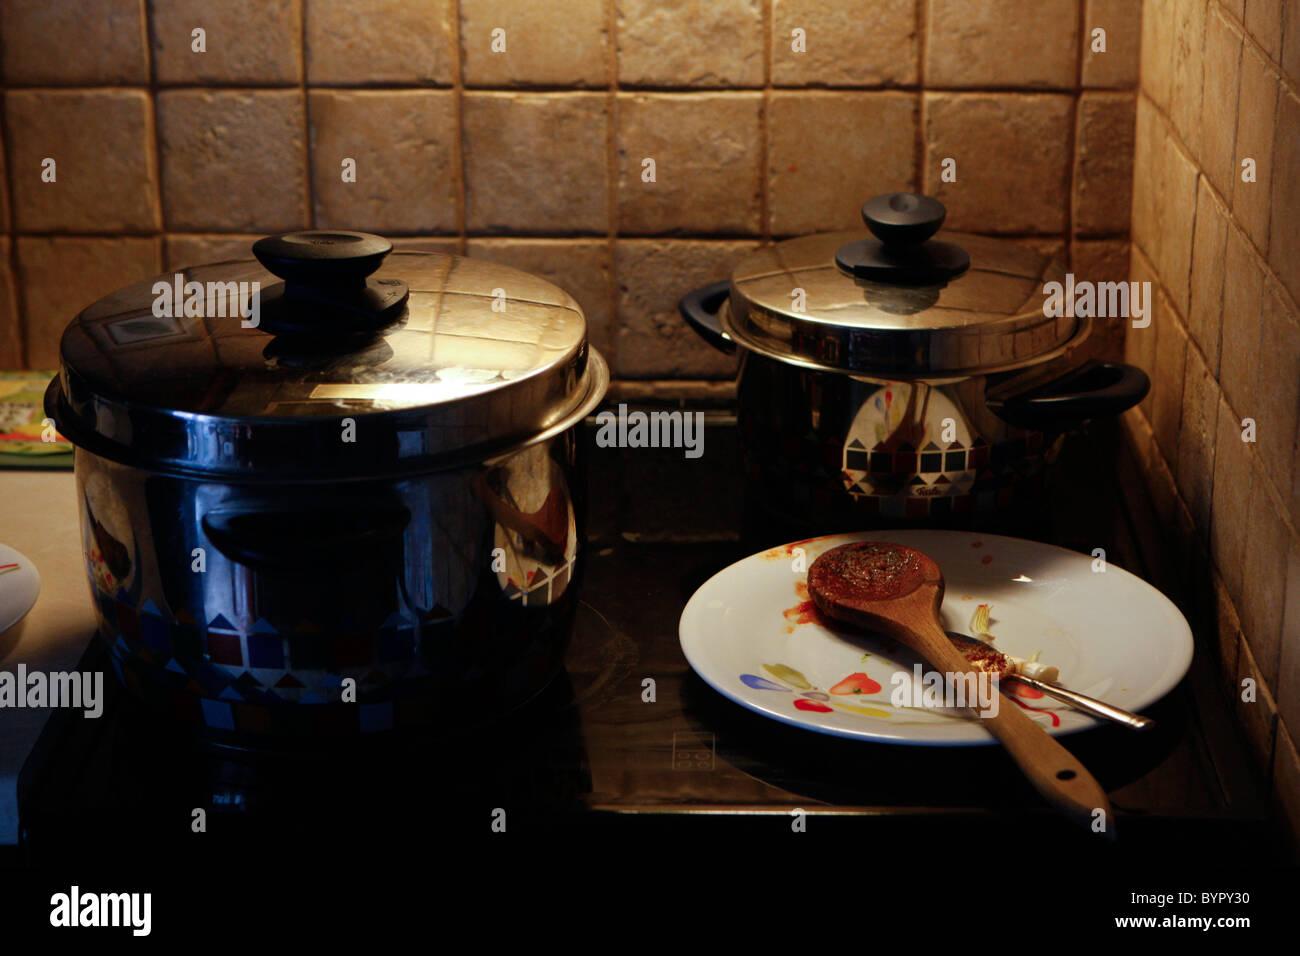 Dirty Cooker Fotos Dirty Cooker Imagens De Stock Alamy